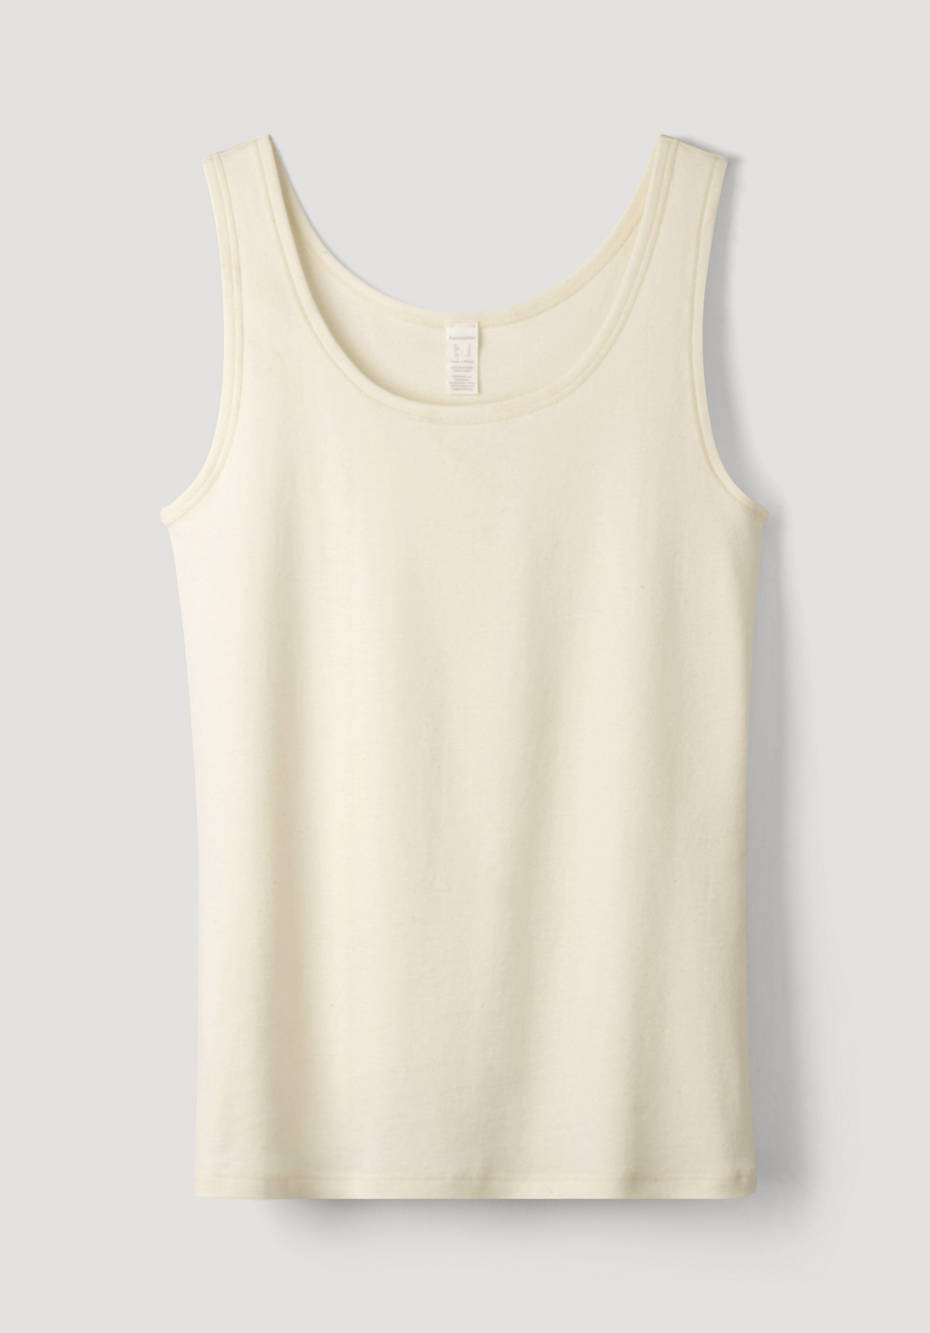 Armpit shirt ModernNATURE made of pure organic cotton